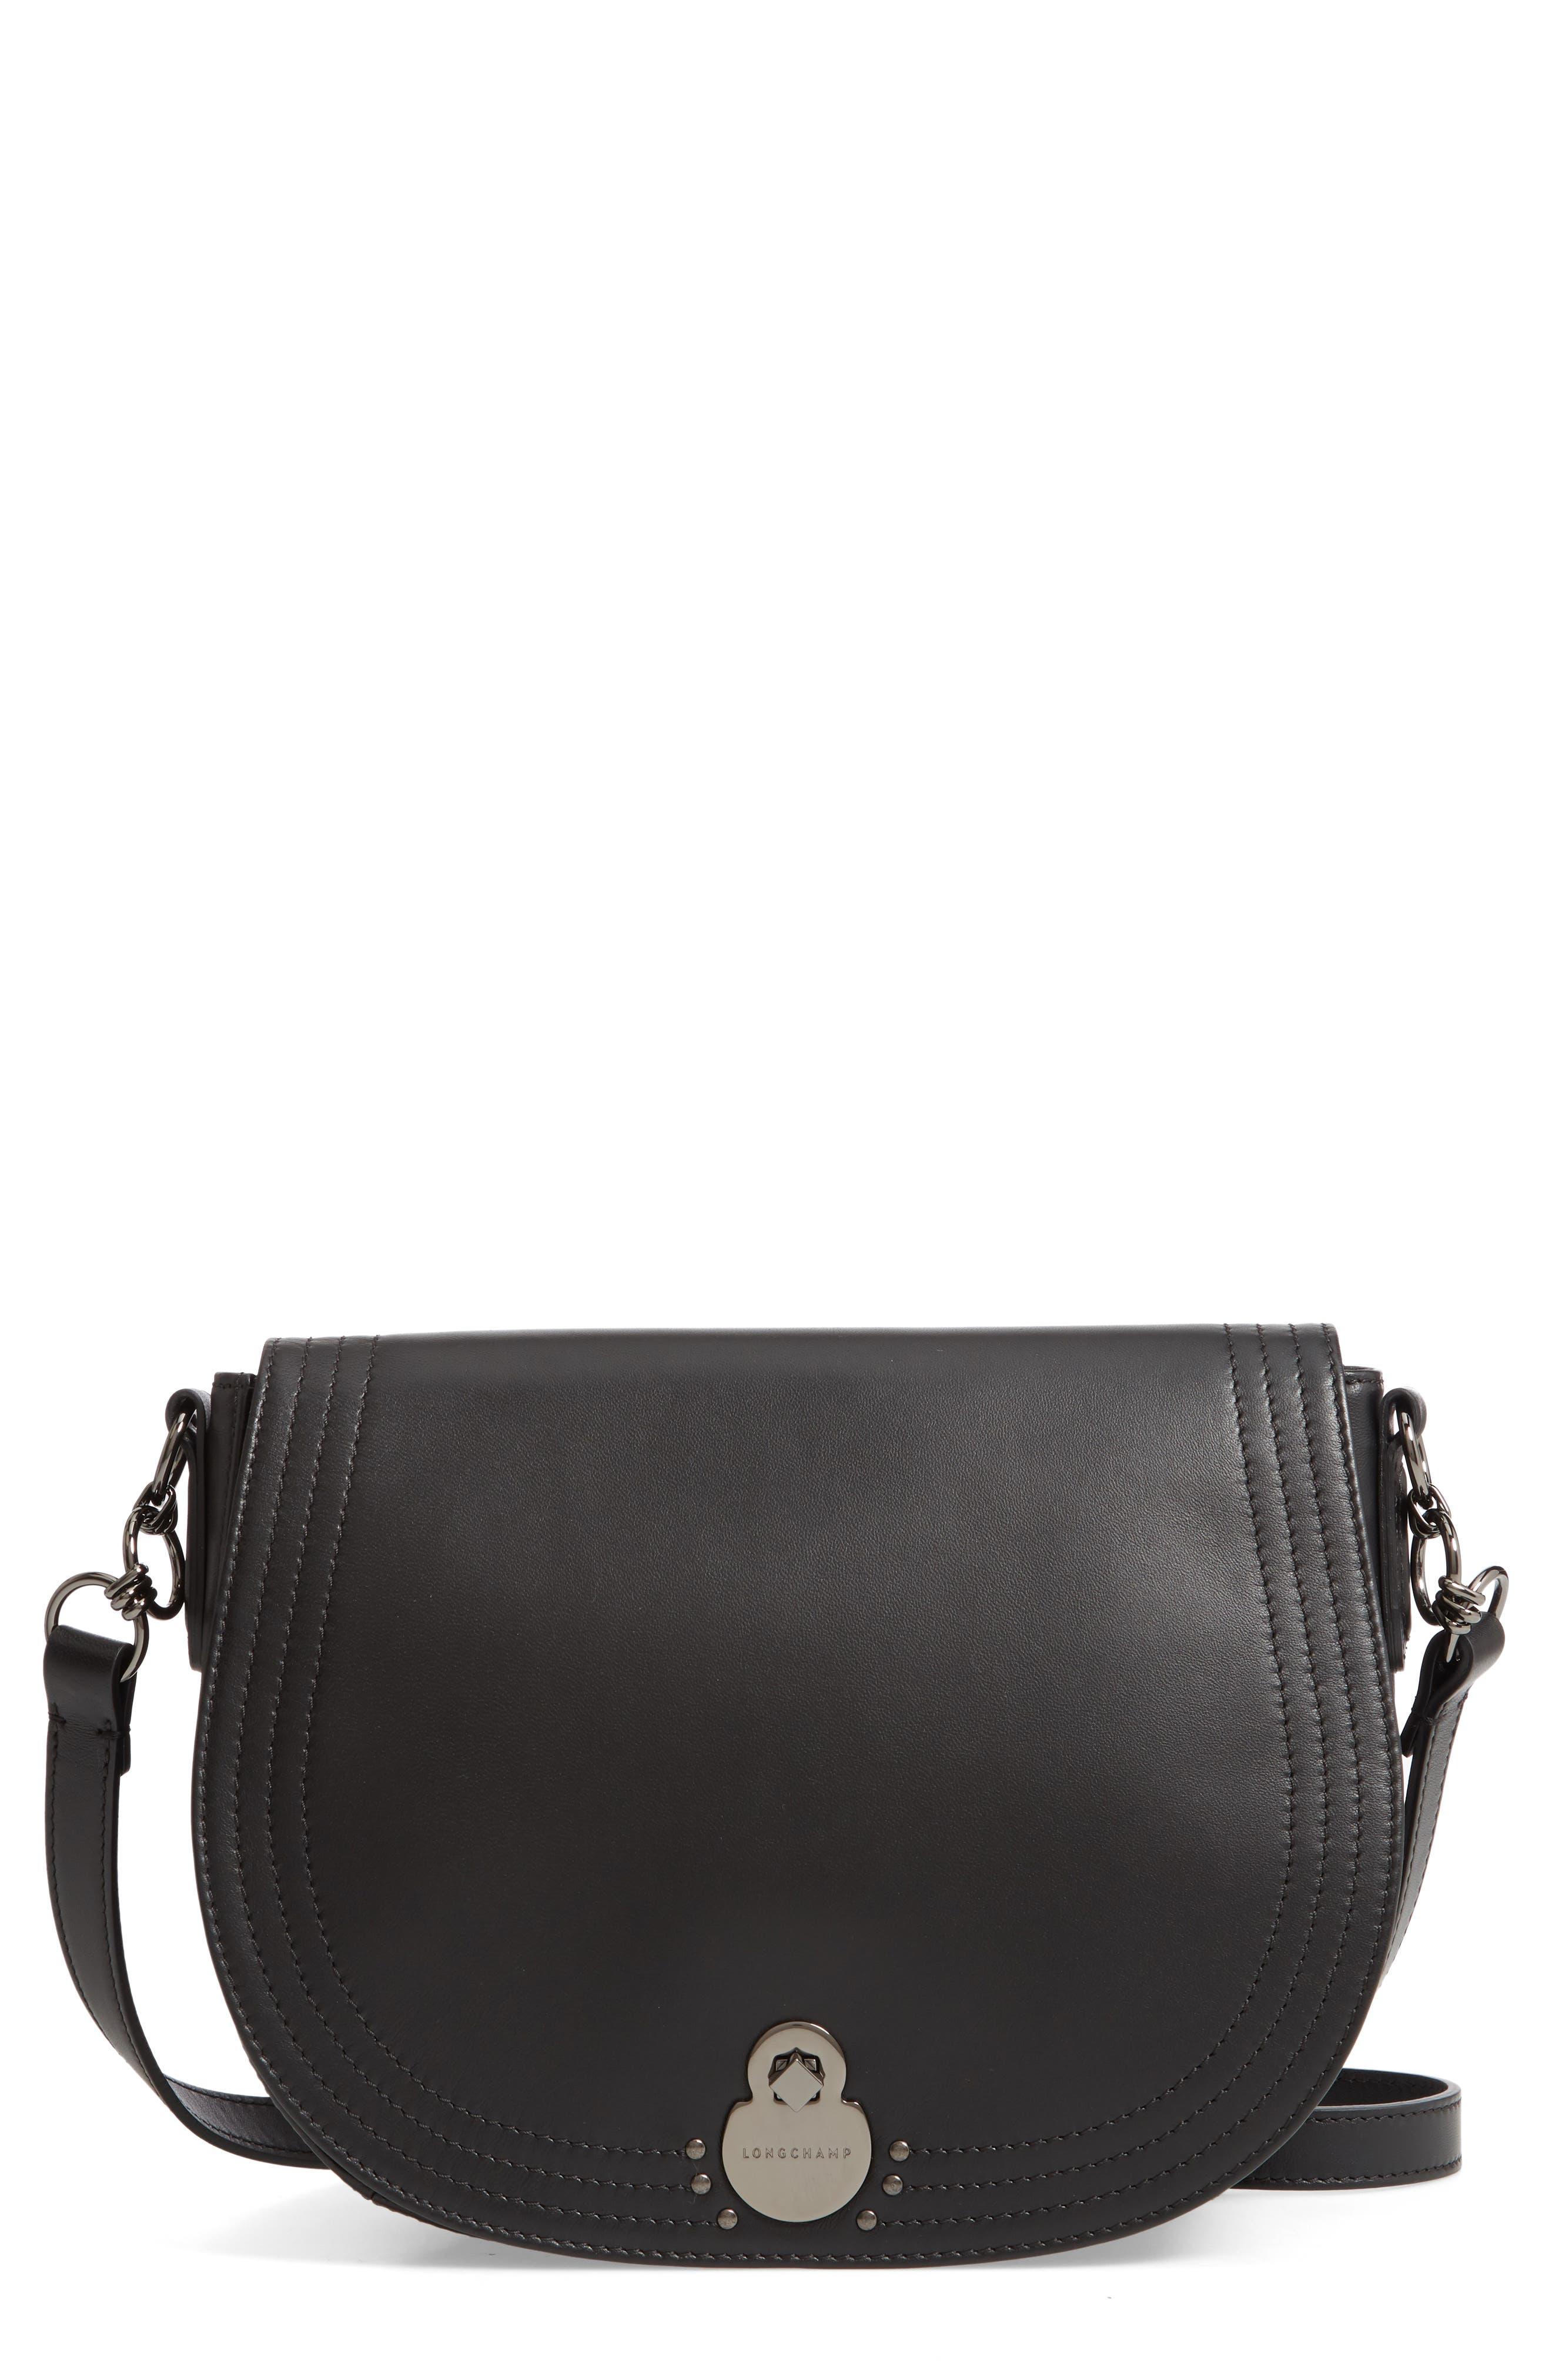 Medium Cavalcade Leather Saddle Bag,                         Main,                         color, BLACK